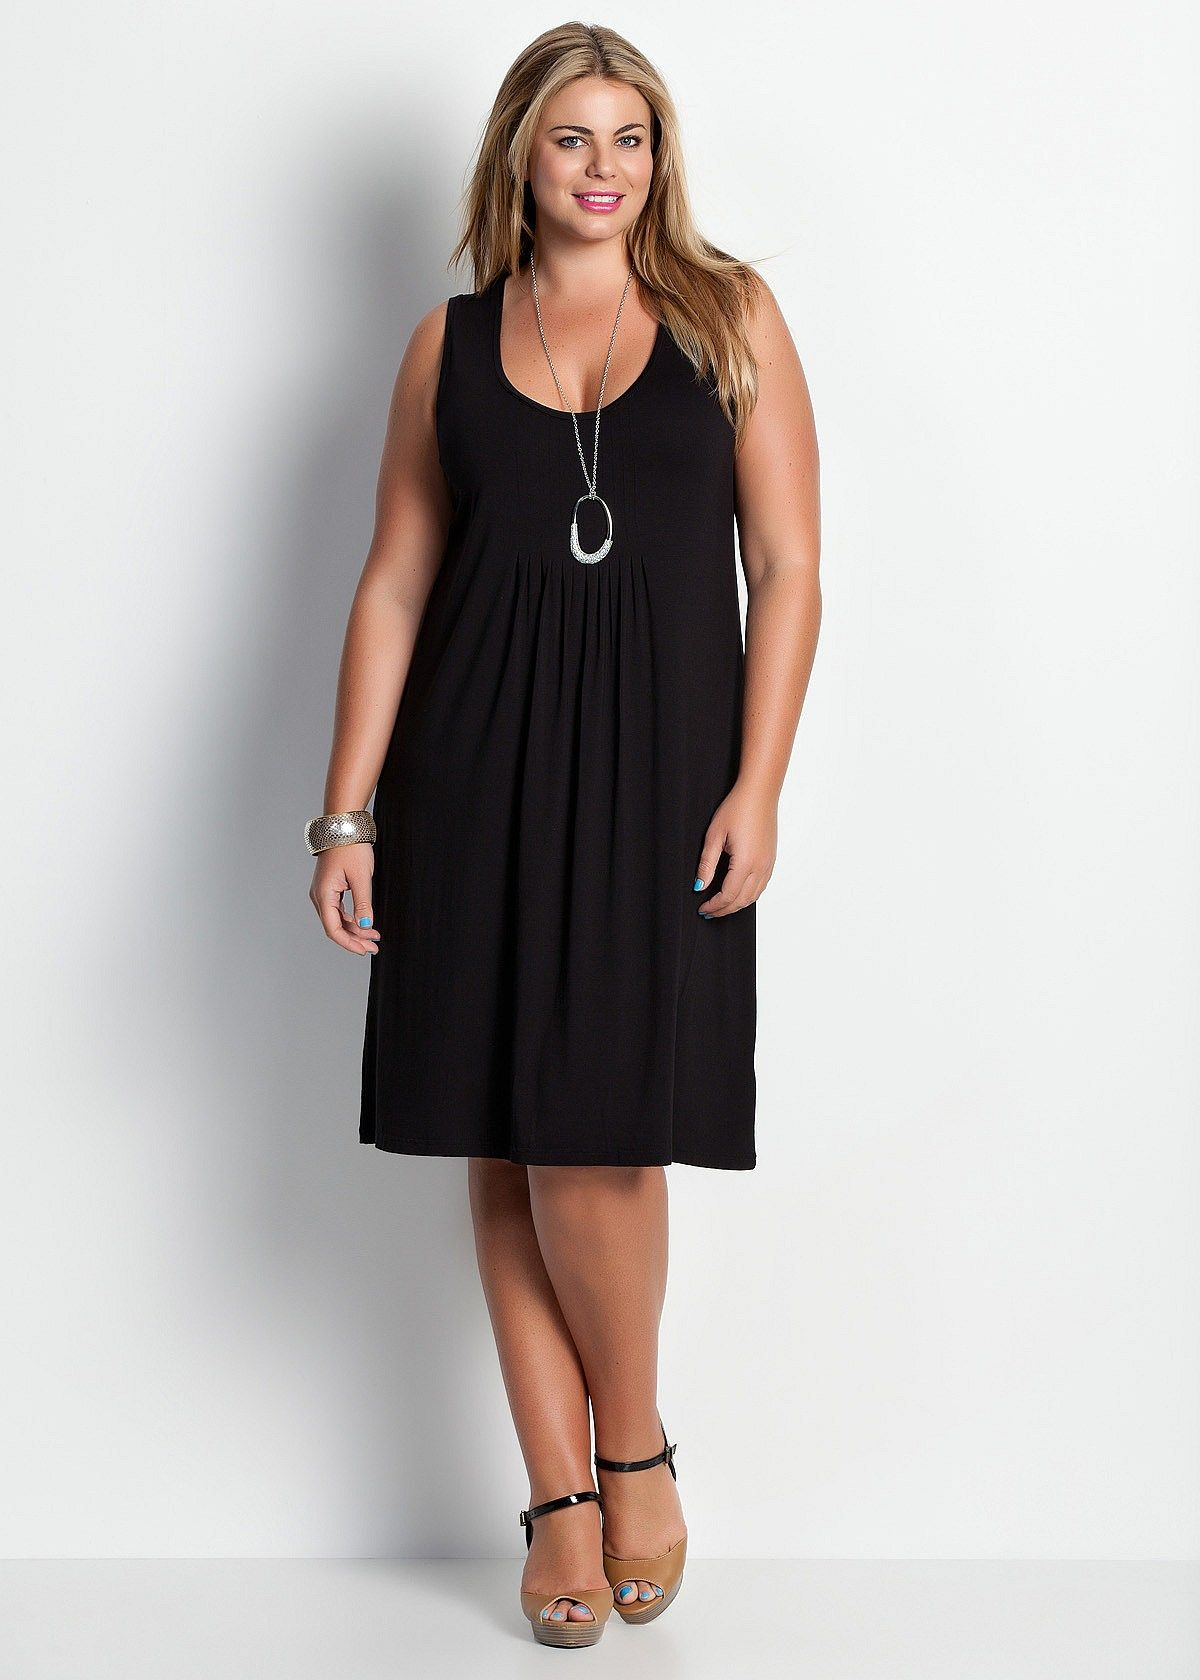 Plus Size Dresses Maxi Large Sizes Australian Dresses Big